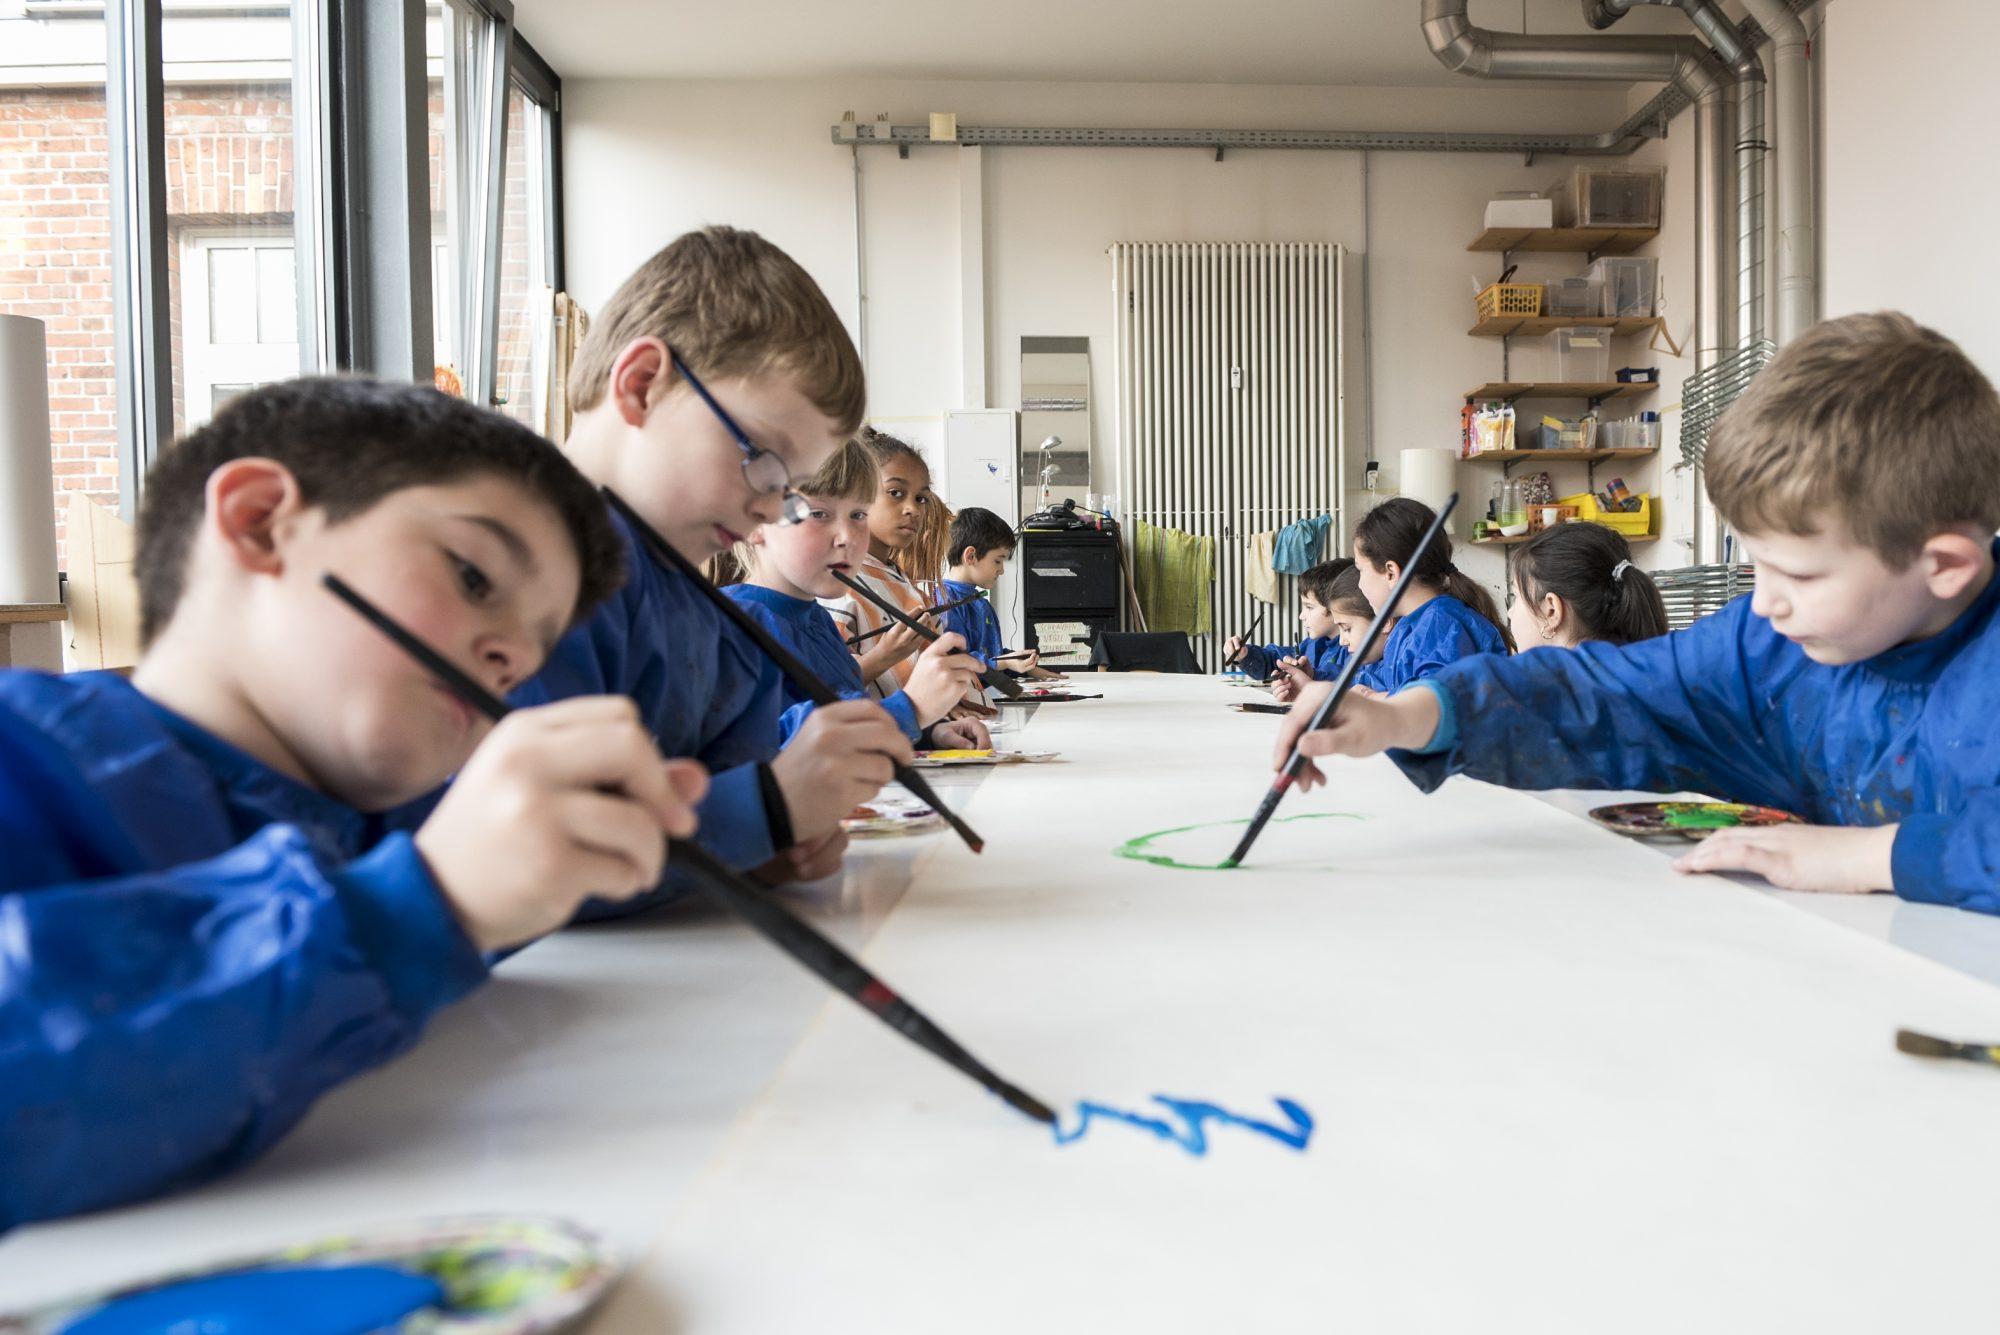 Roter Hahn Kunst kinderatelier roter hahn kultur vor ort bremen gröpelingen